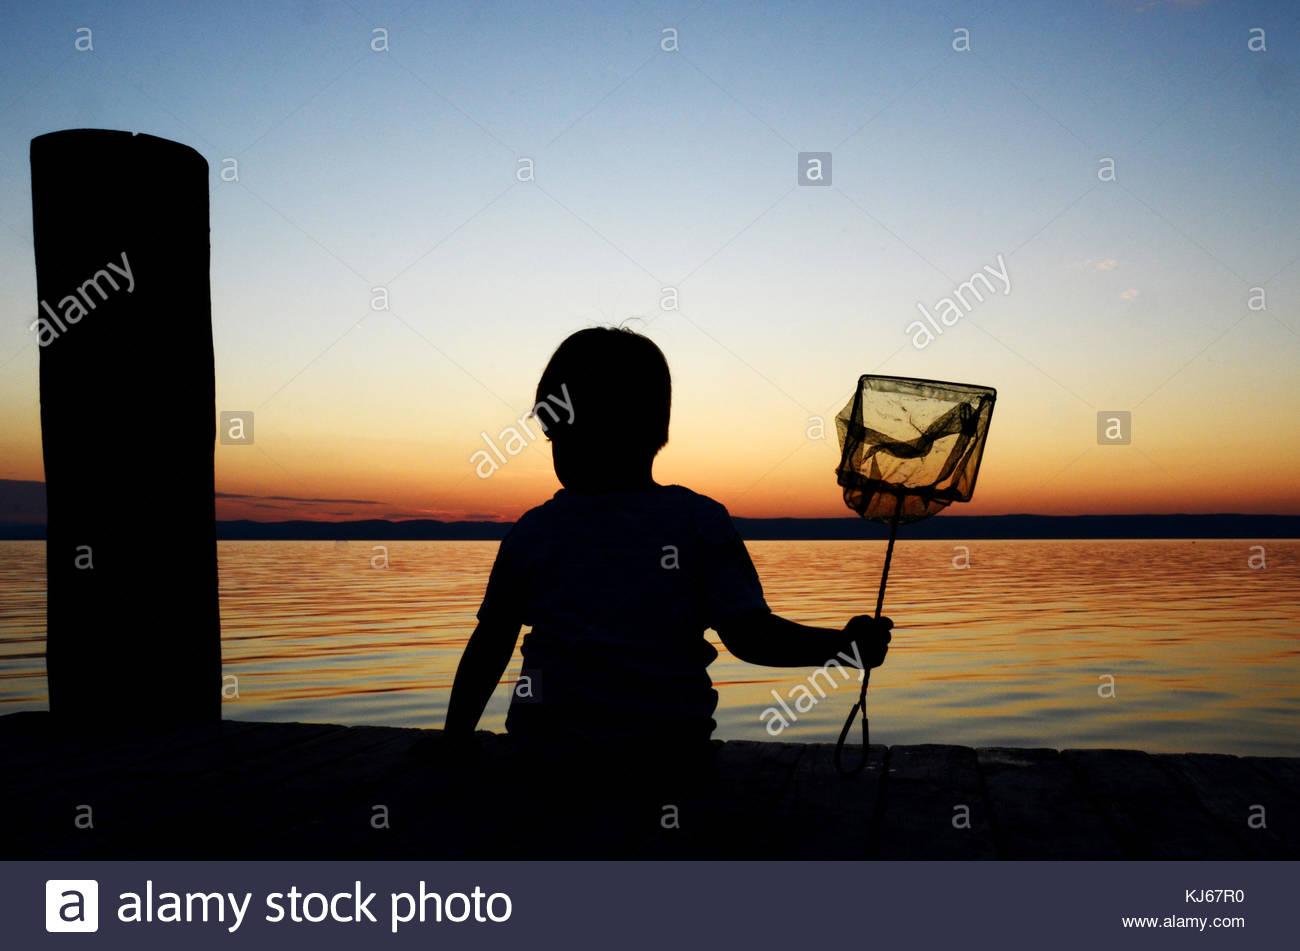 Toddler with landing net - Stock Image